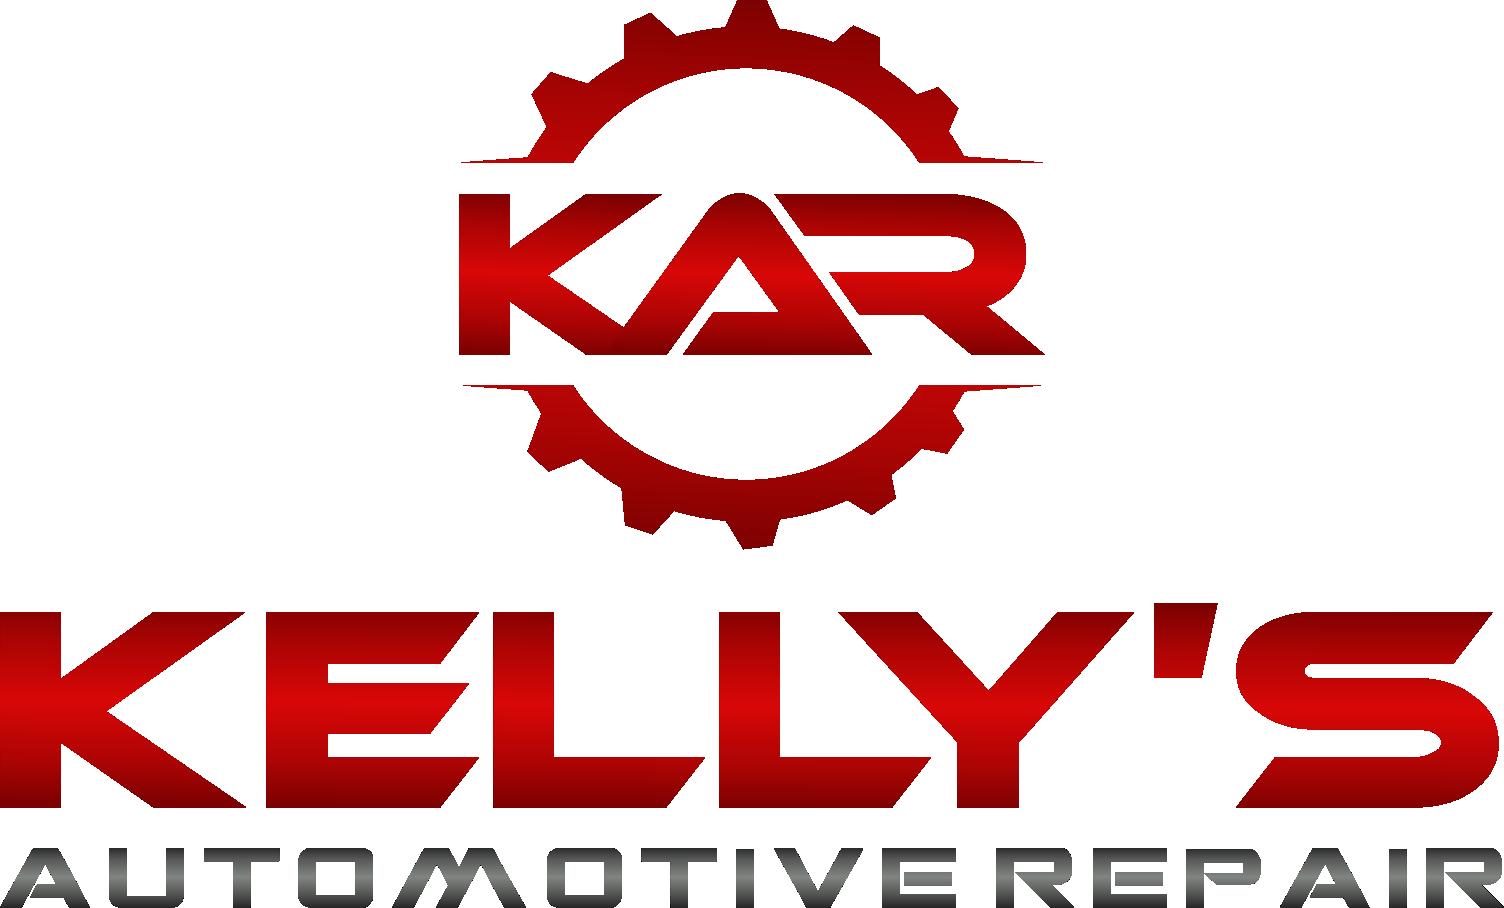 Kelly_s-Automotive-Repair